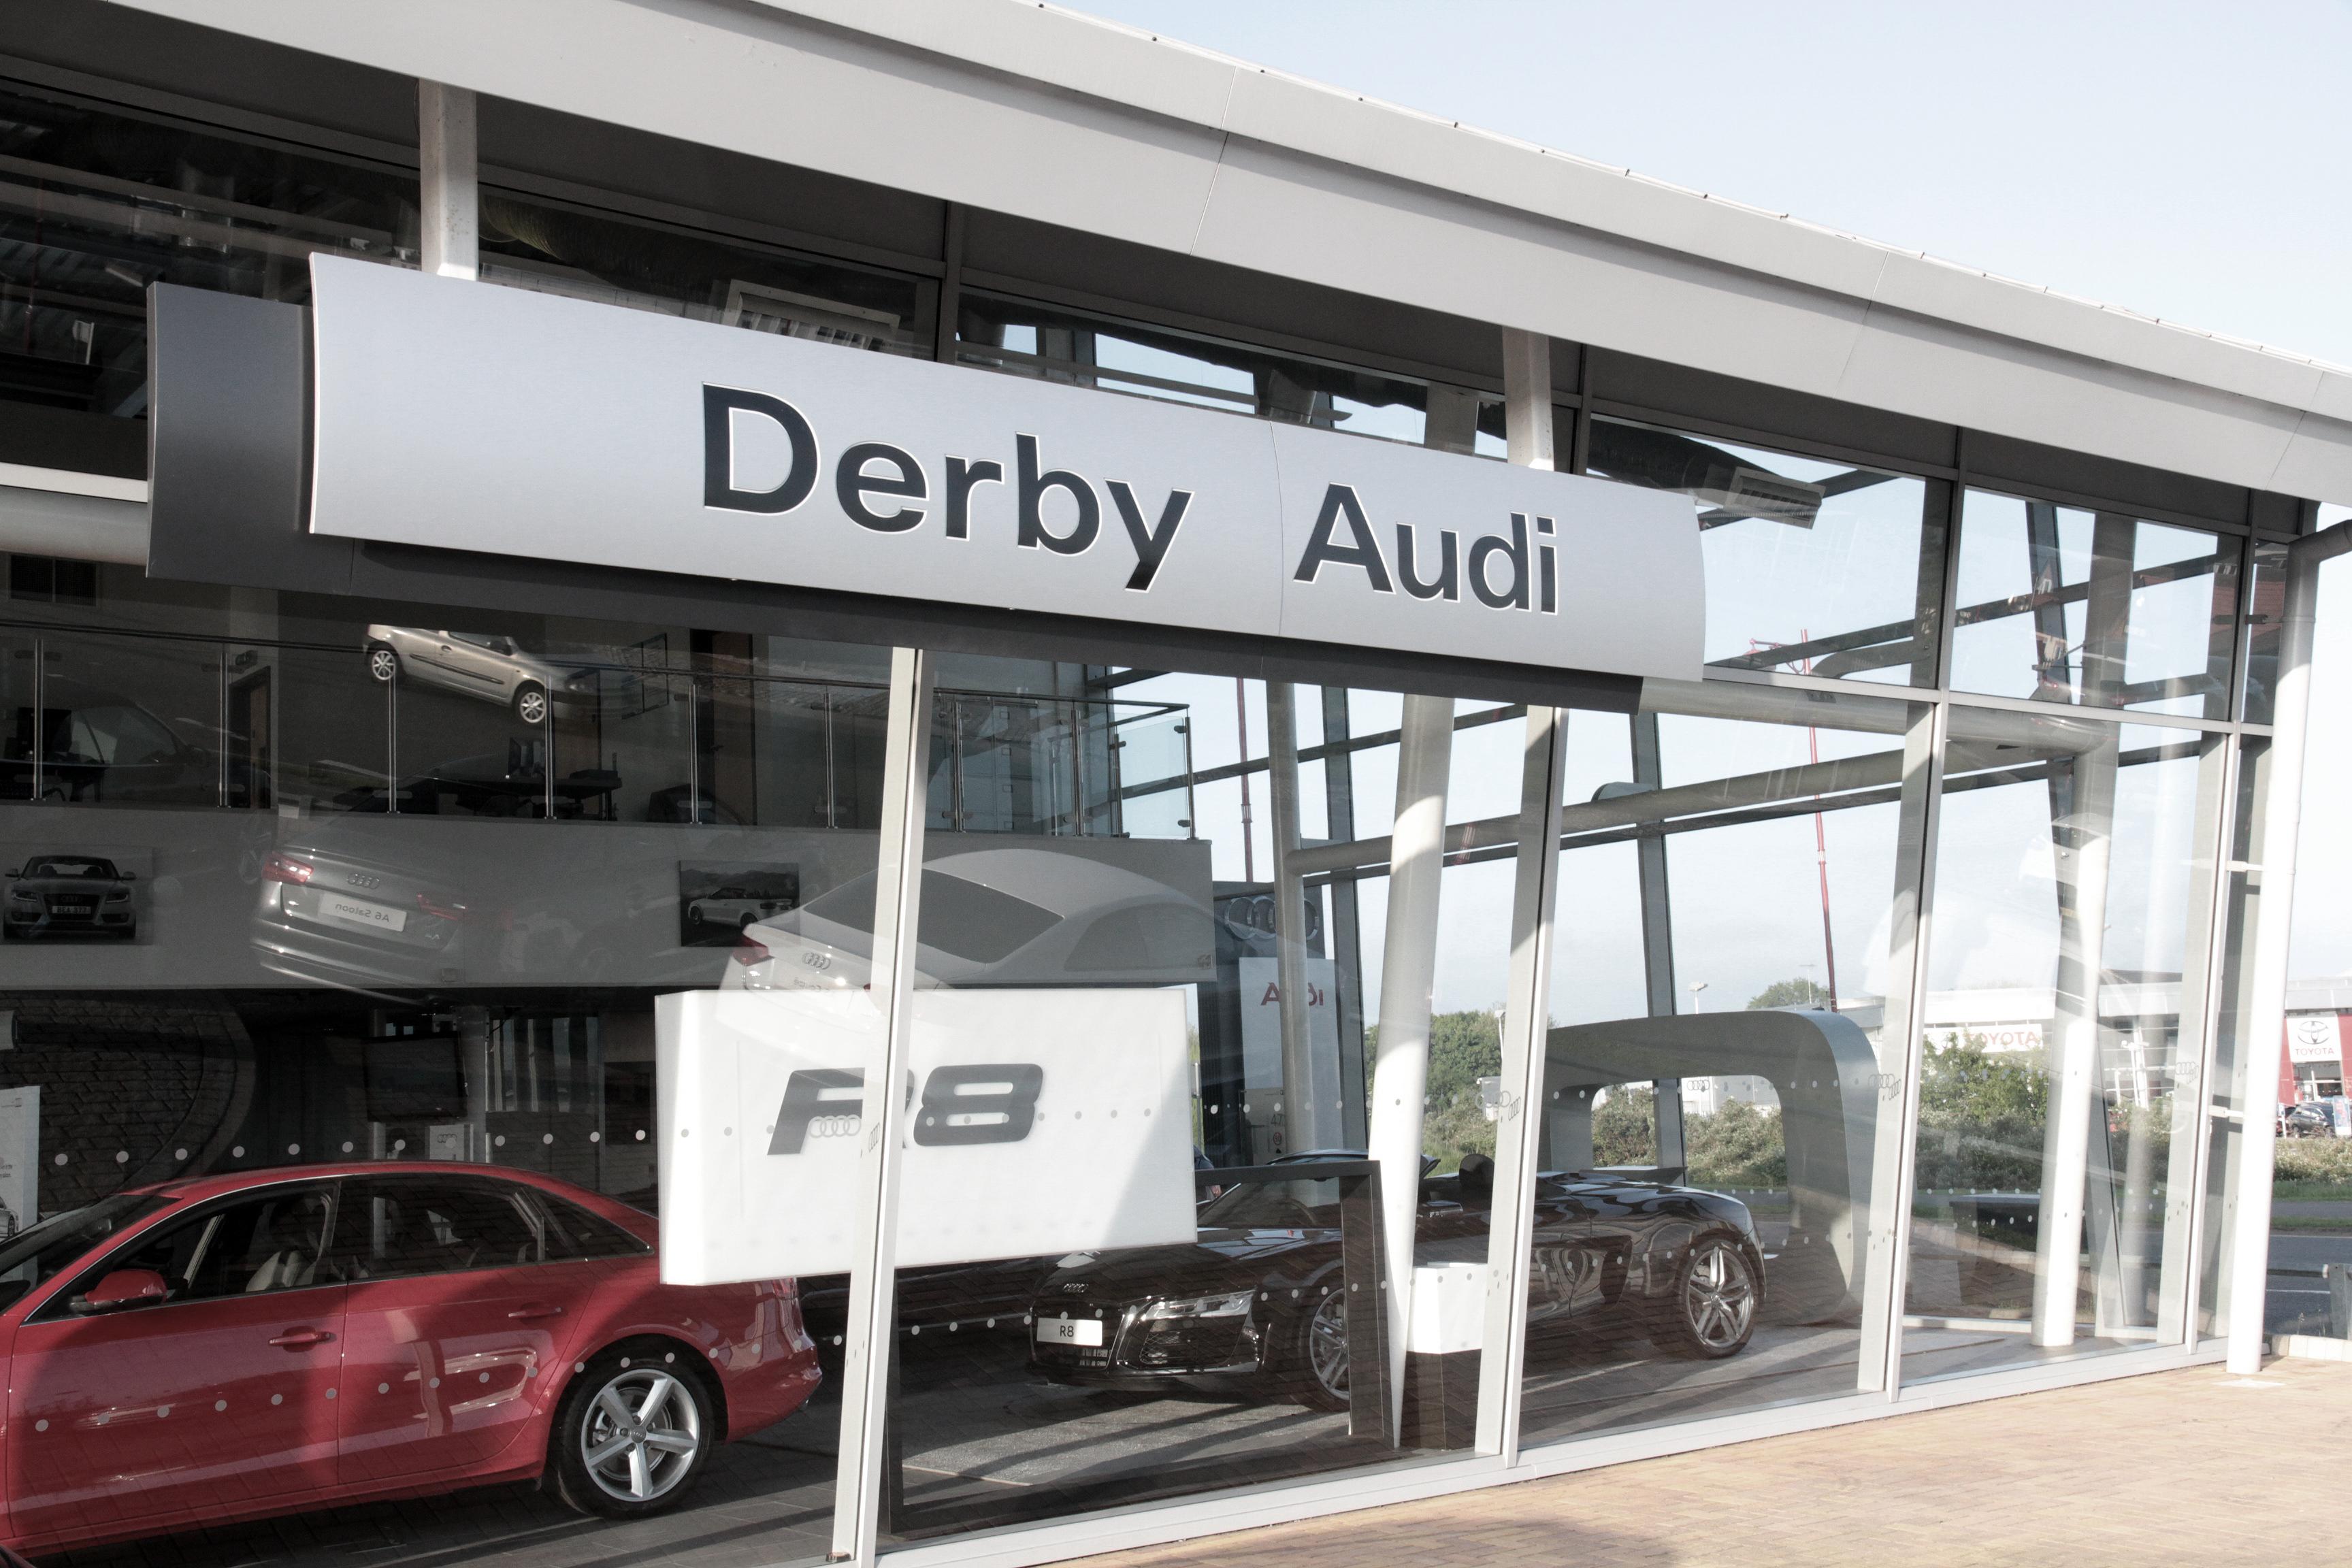 Derby Audi